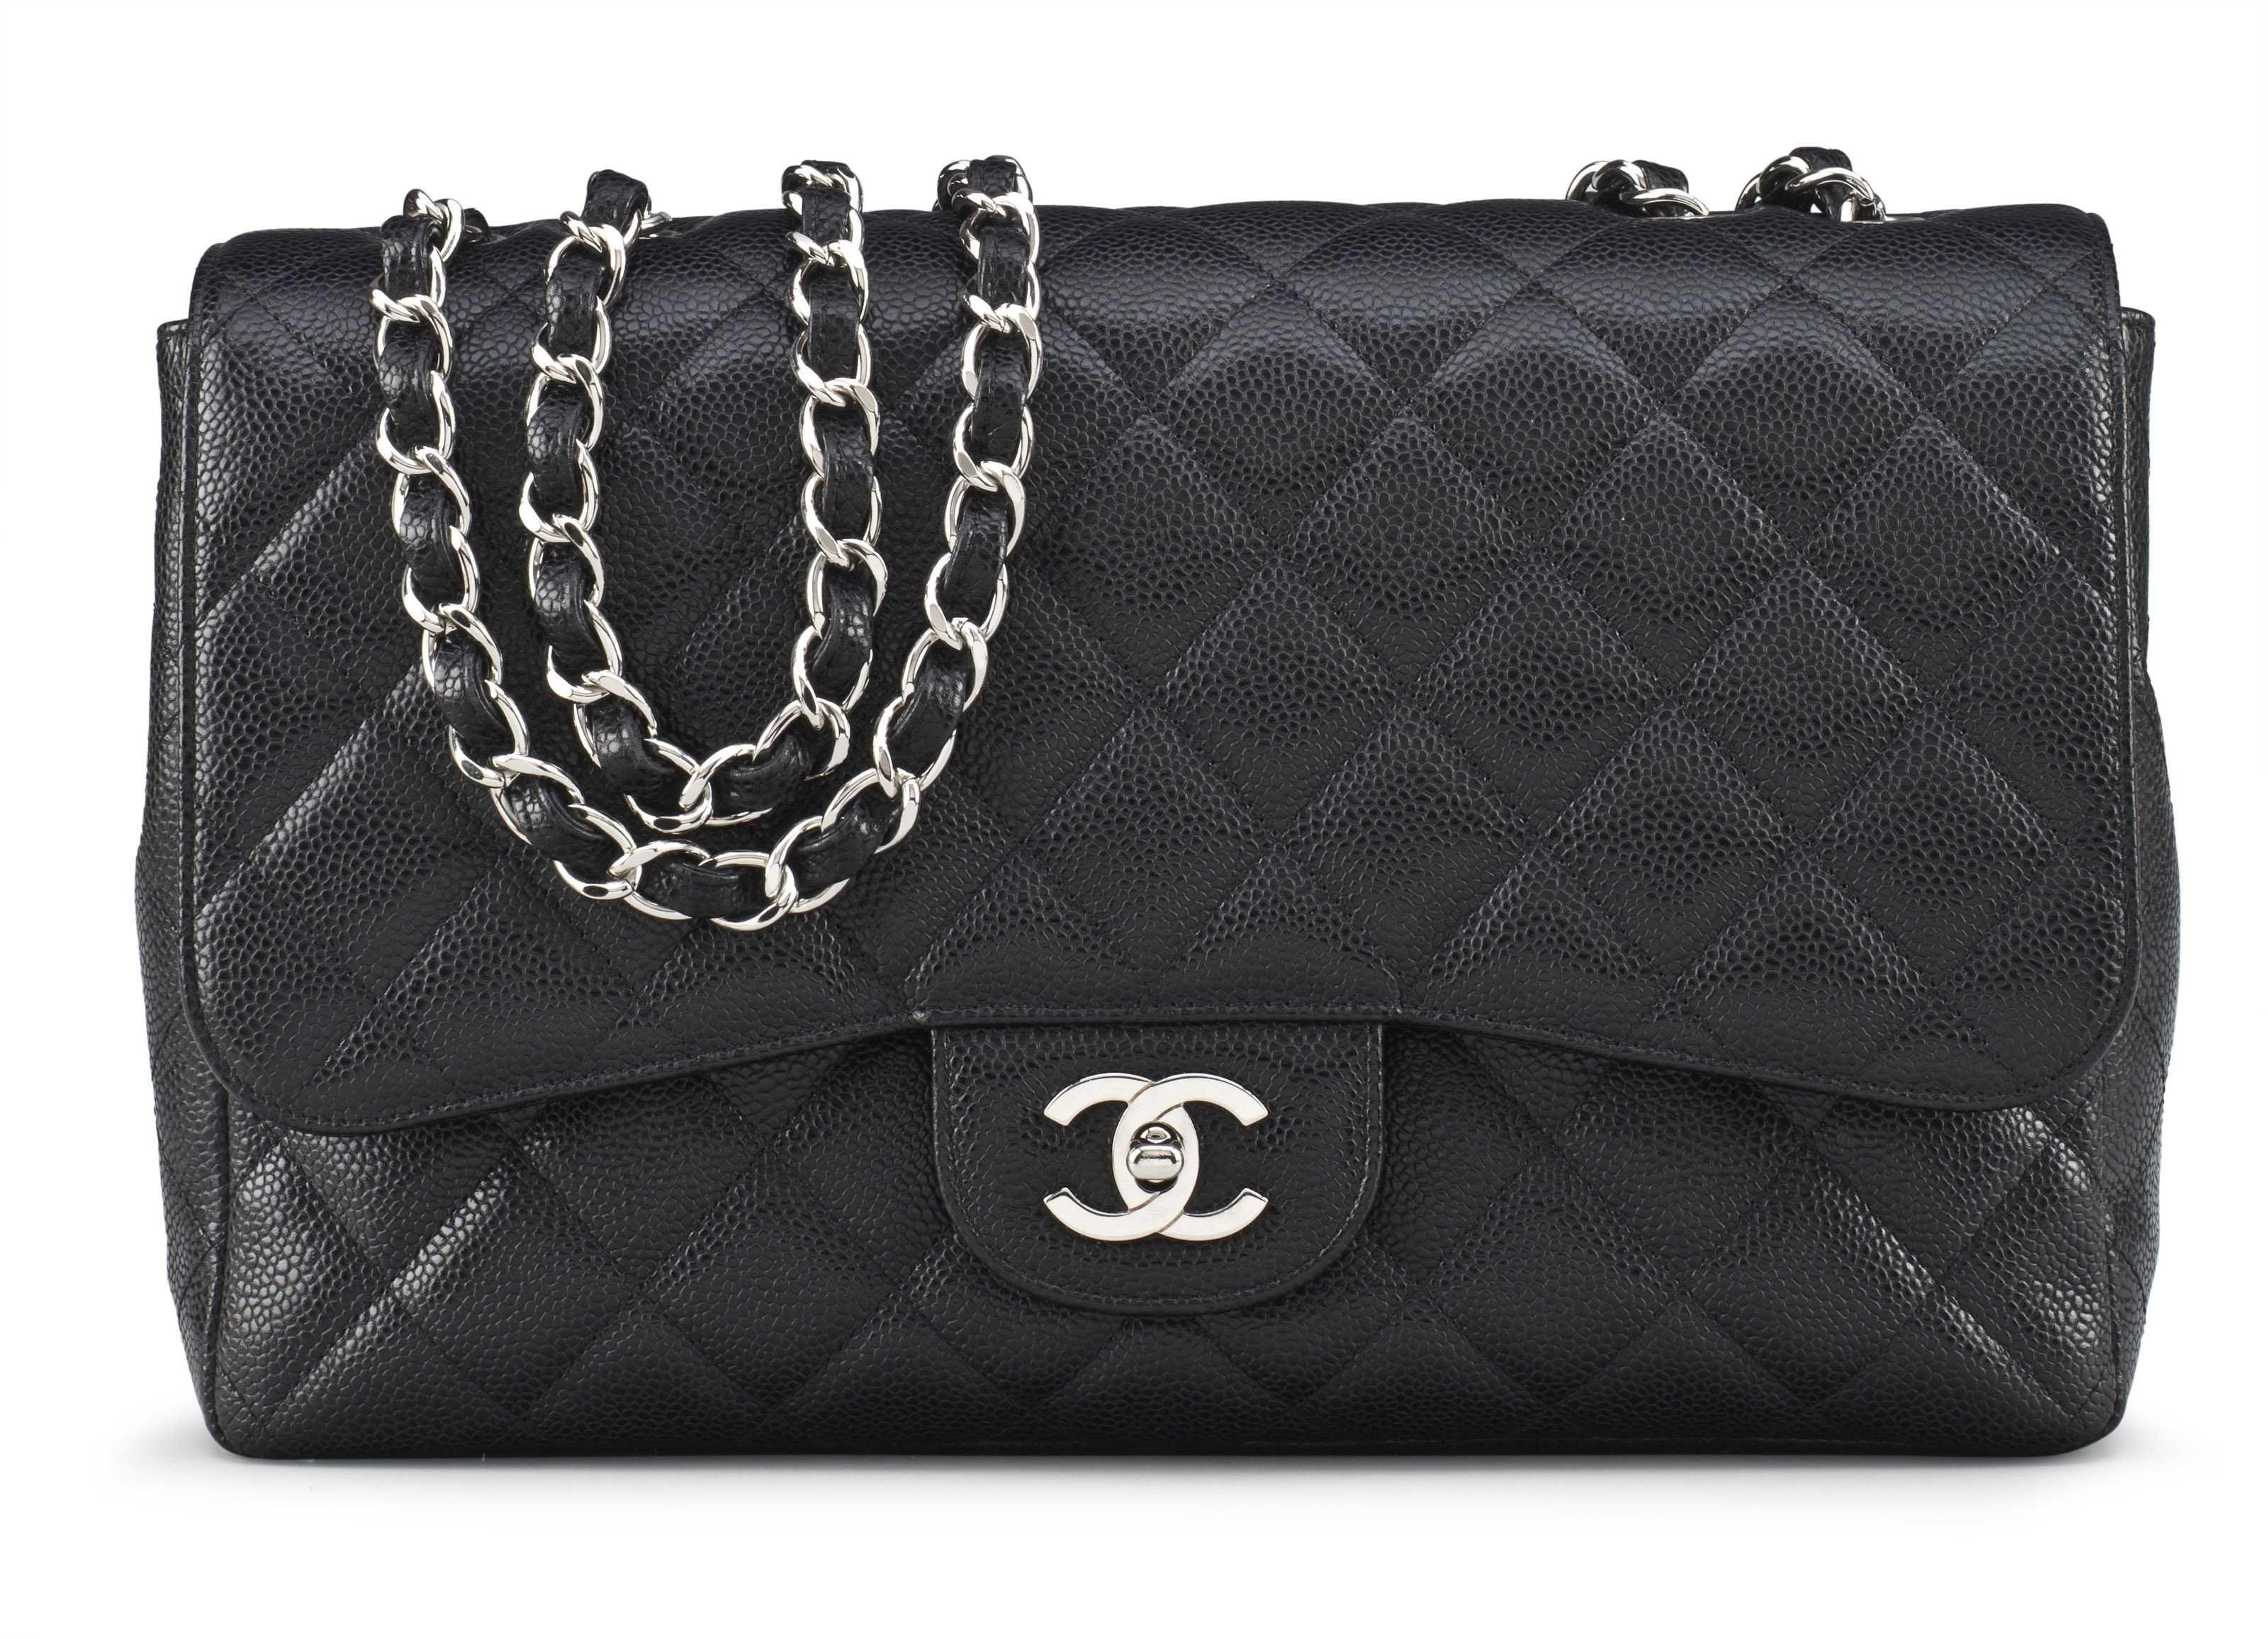 f980062f7424c A black caviar leather jumbo single flap bag with silver hardware  chanel